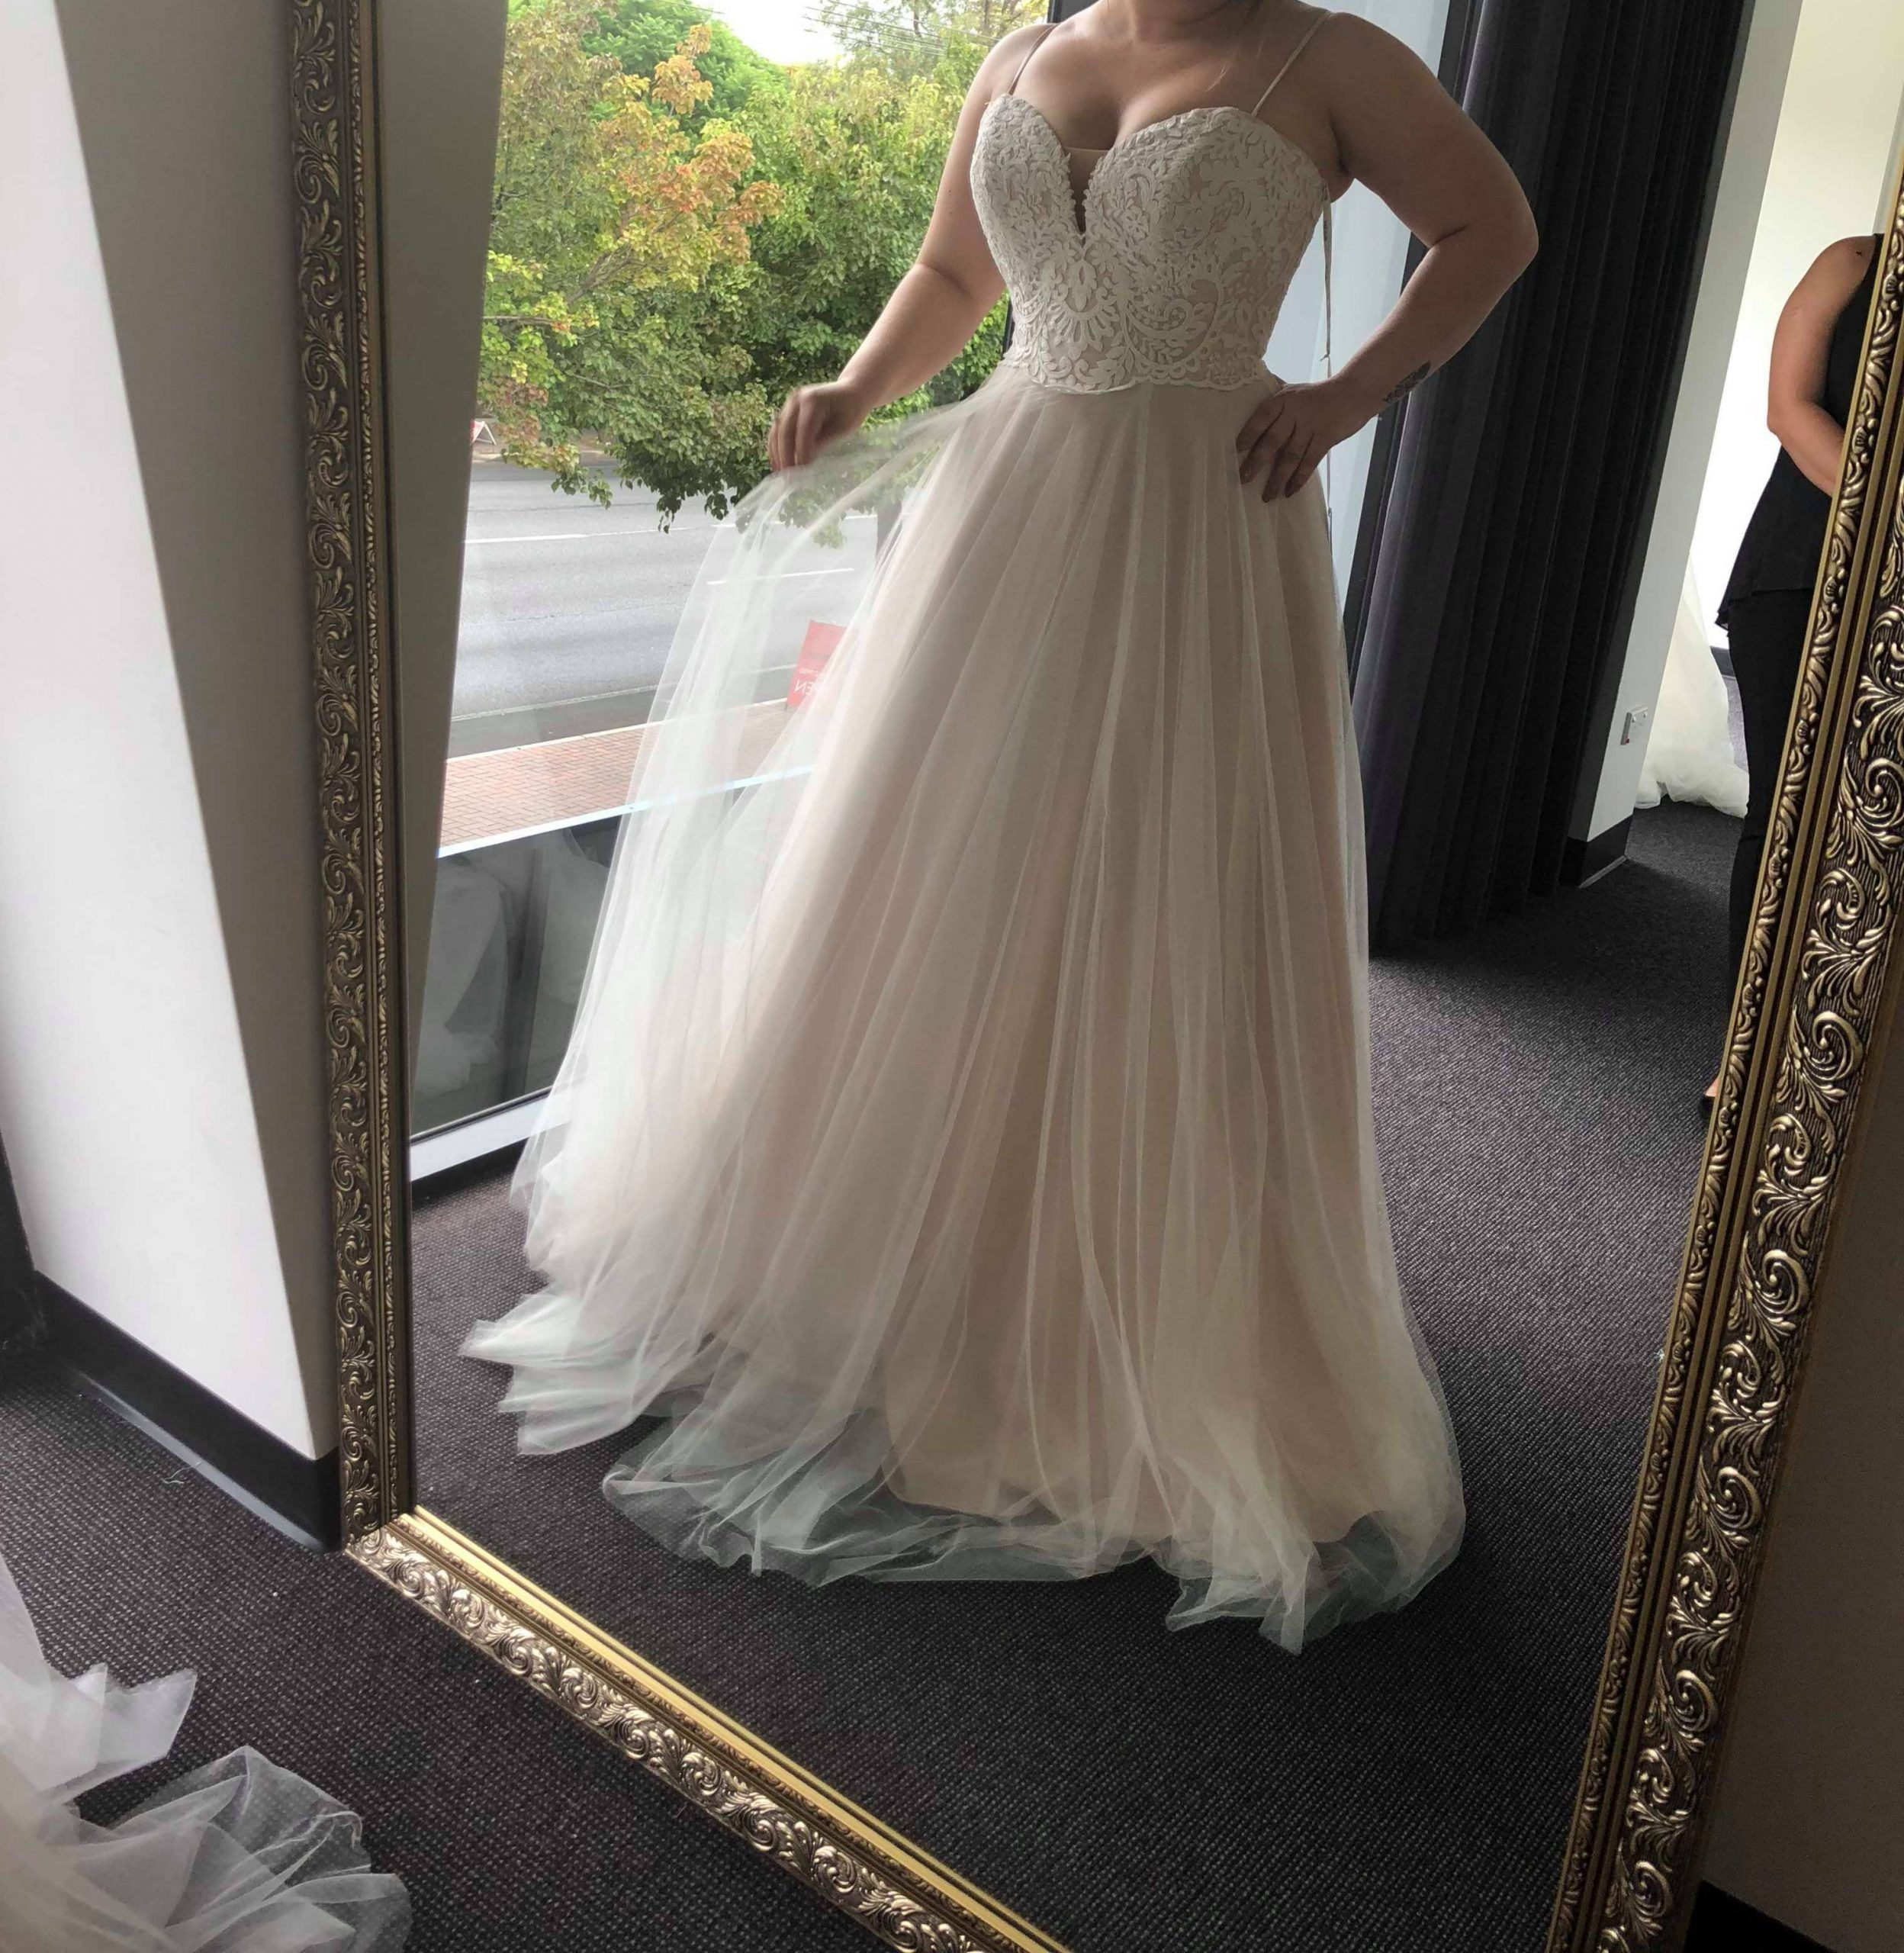 Stella York Wedding Dress Sold Elsewhere Only Dream Dresses Stella York Wedding Dress Wedding Dresses Preloved Wedding Dresses [ 2560 x 2496 Pixel ]